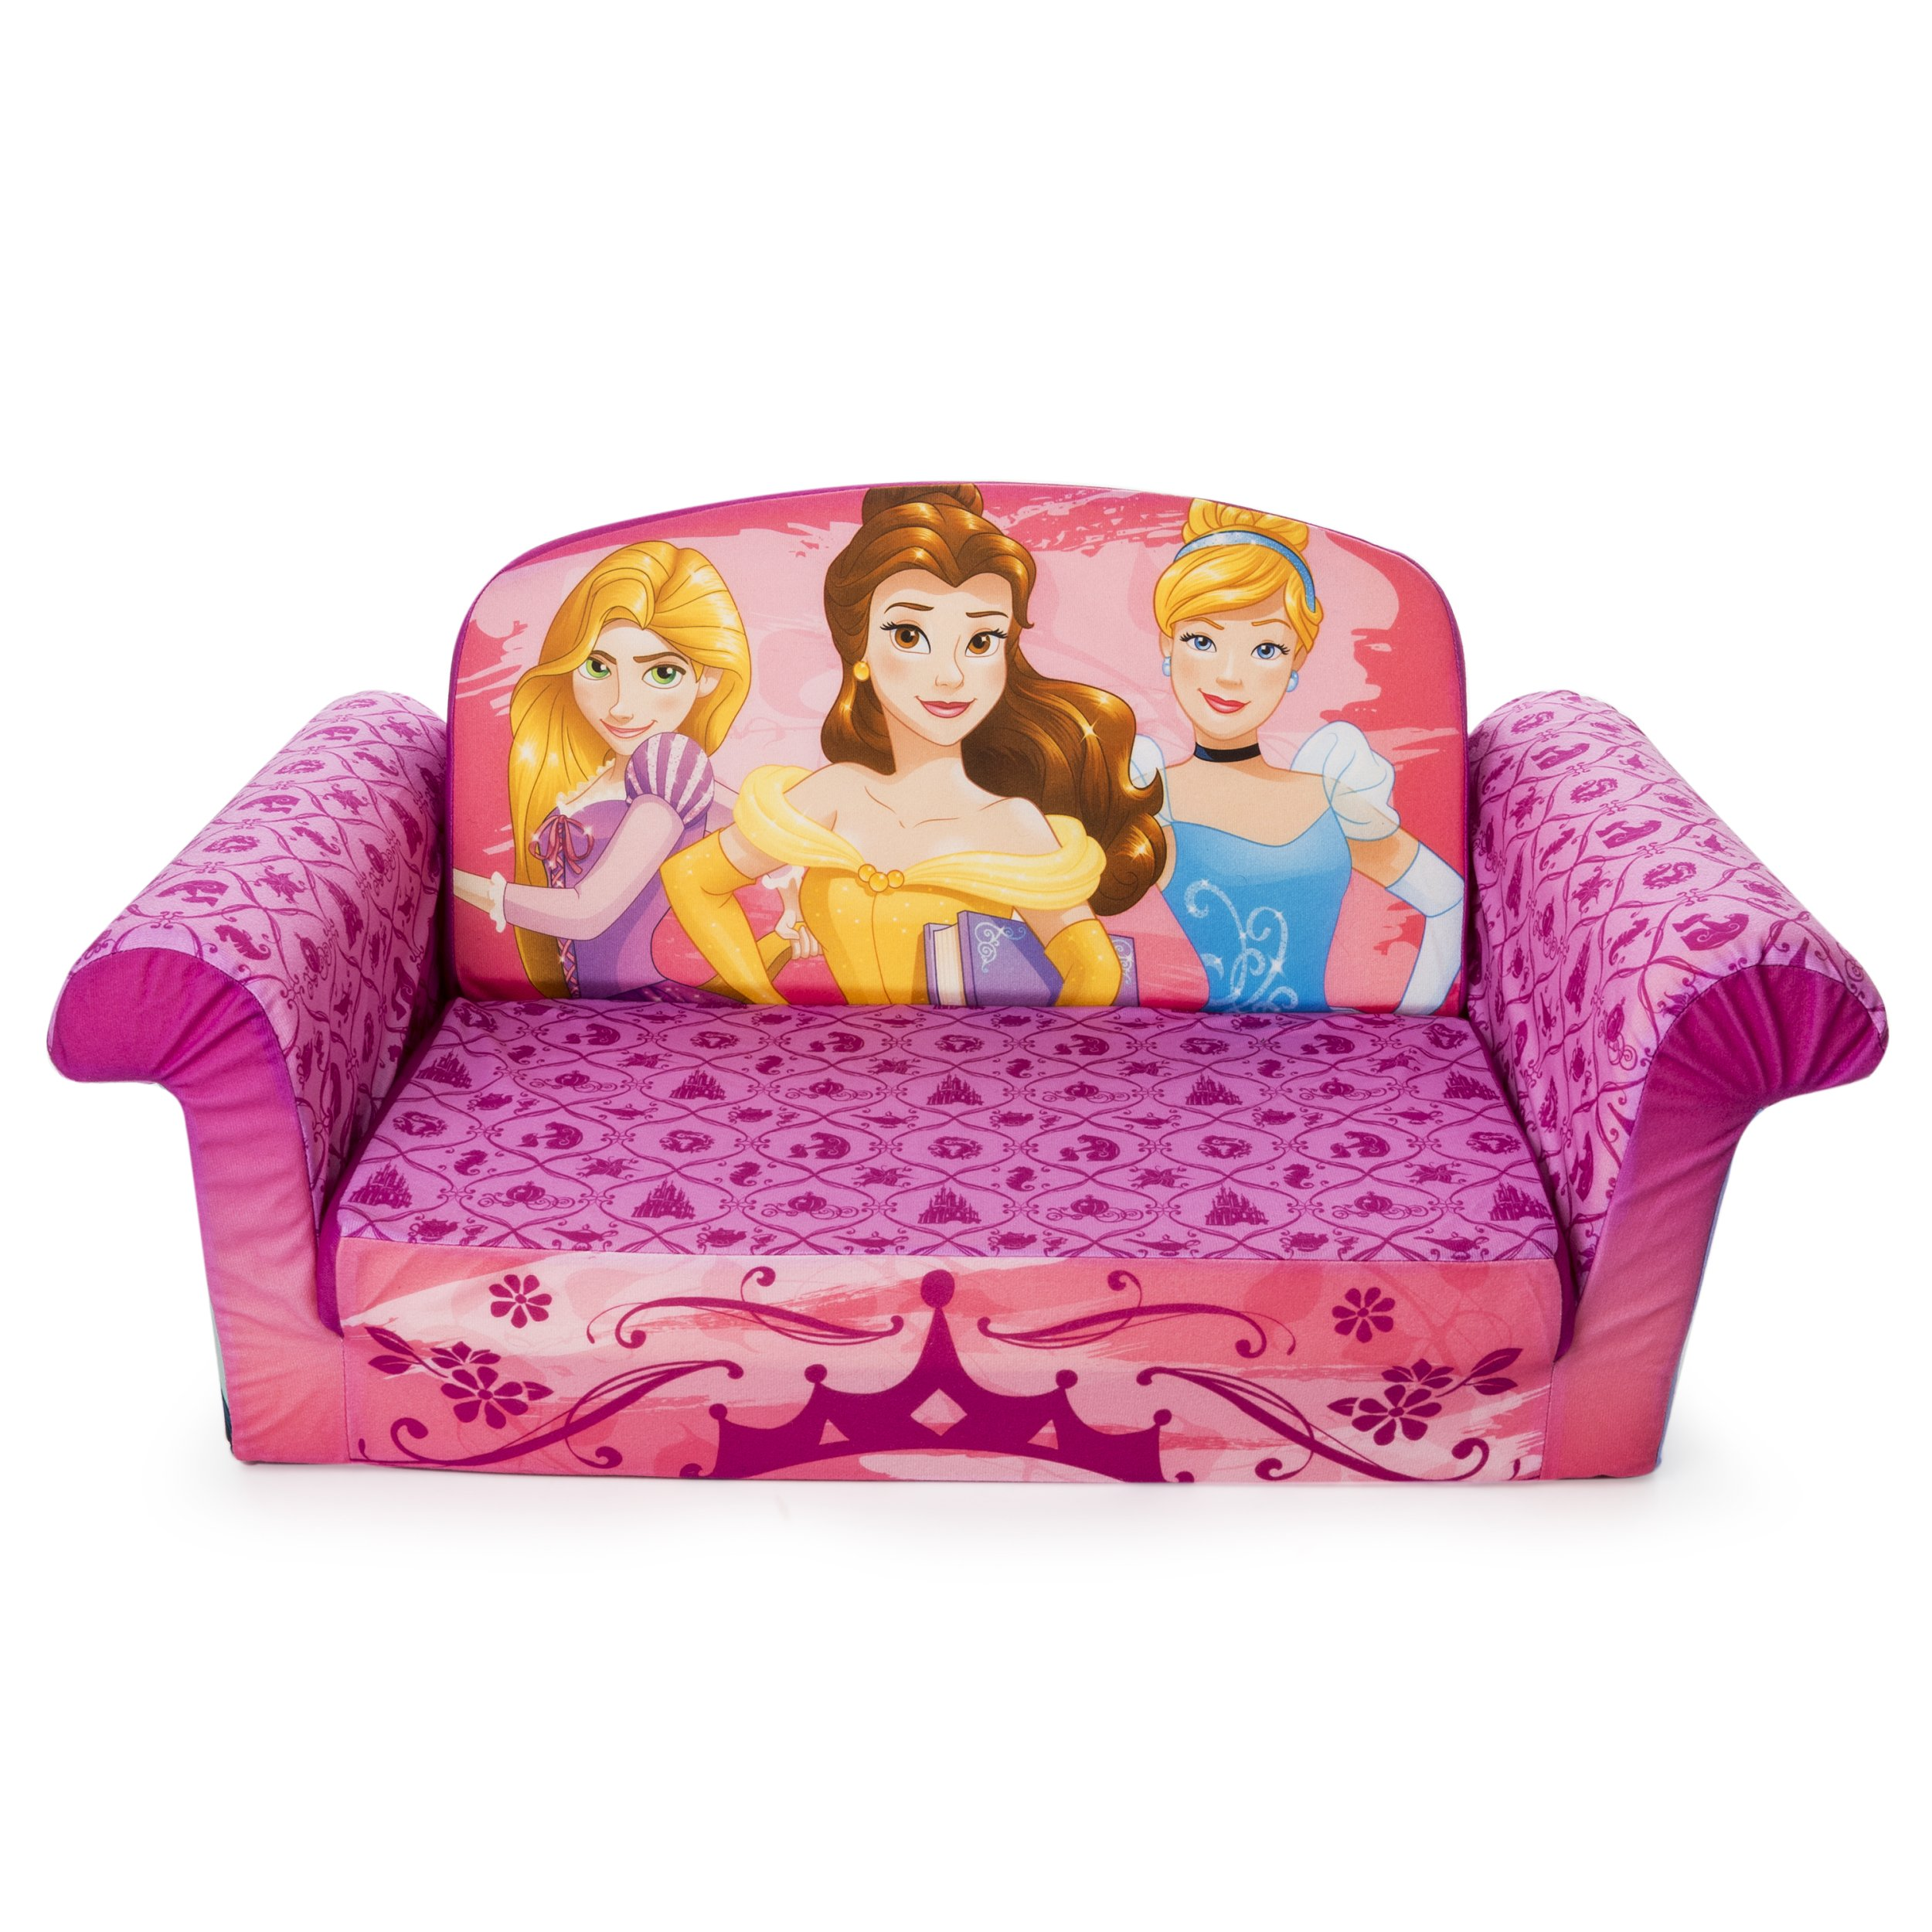 Marshmallow Furniture - Children's 2 in 1 Flip Open Foam Sofa, Disney Princess Flip Open Sofa by Marshmallow Furniture